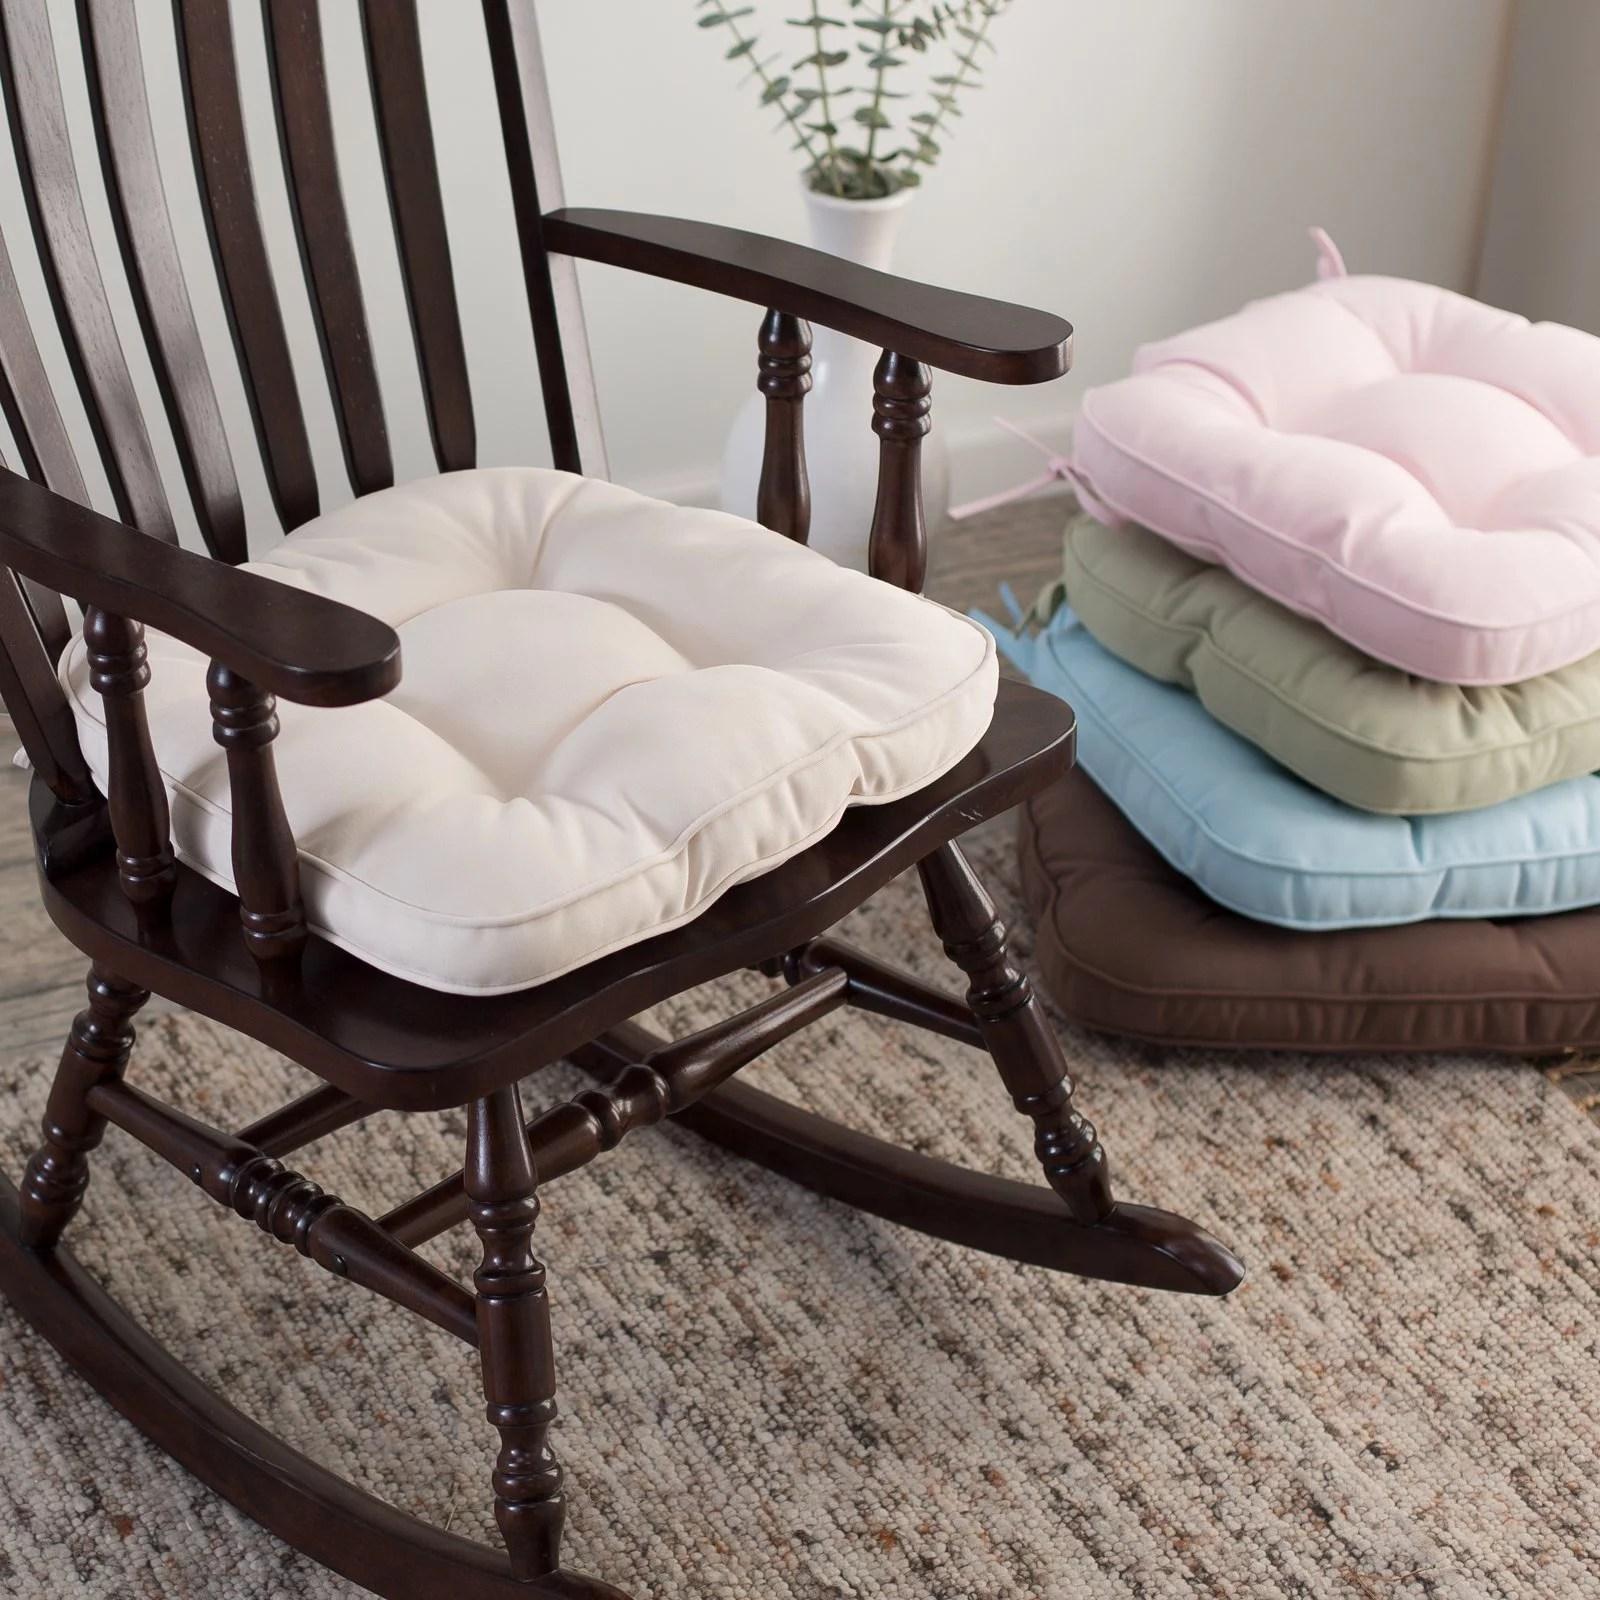 pink nursery rocking chair acme all star soccer 2 piece and ottoman set deauville 18 x 19 tufted rocker cushion walmart com